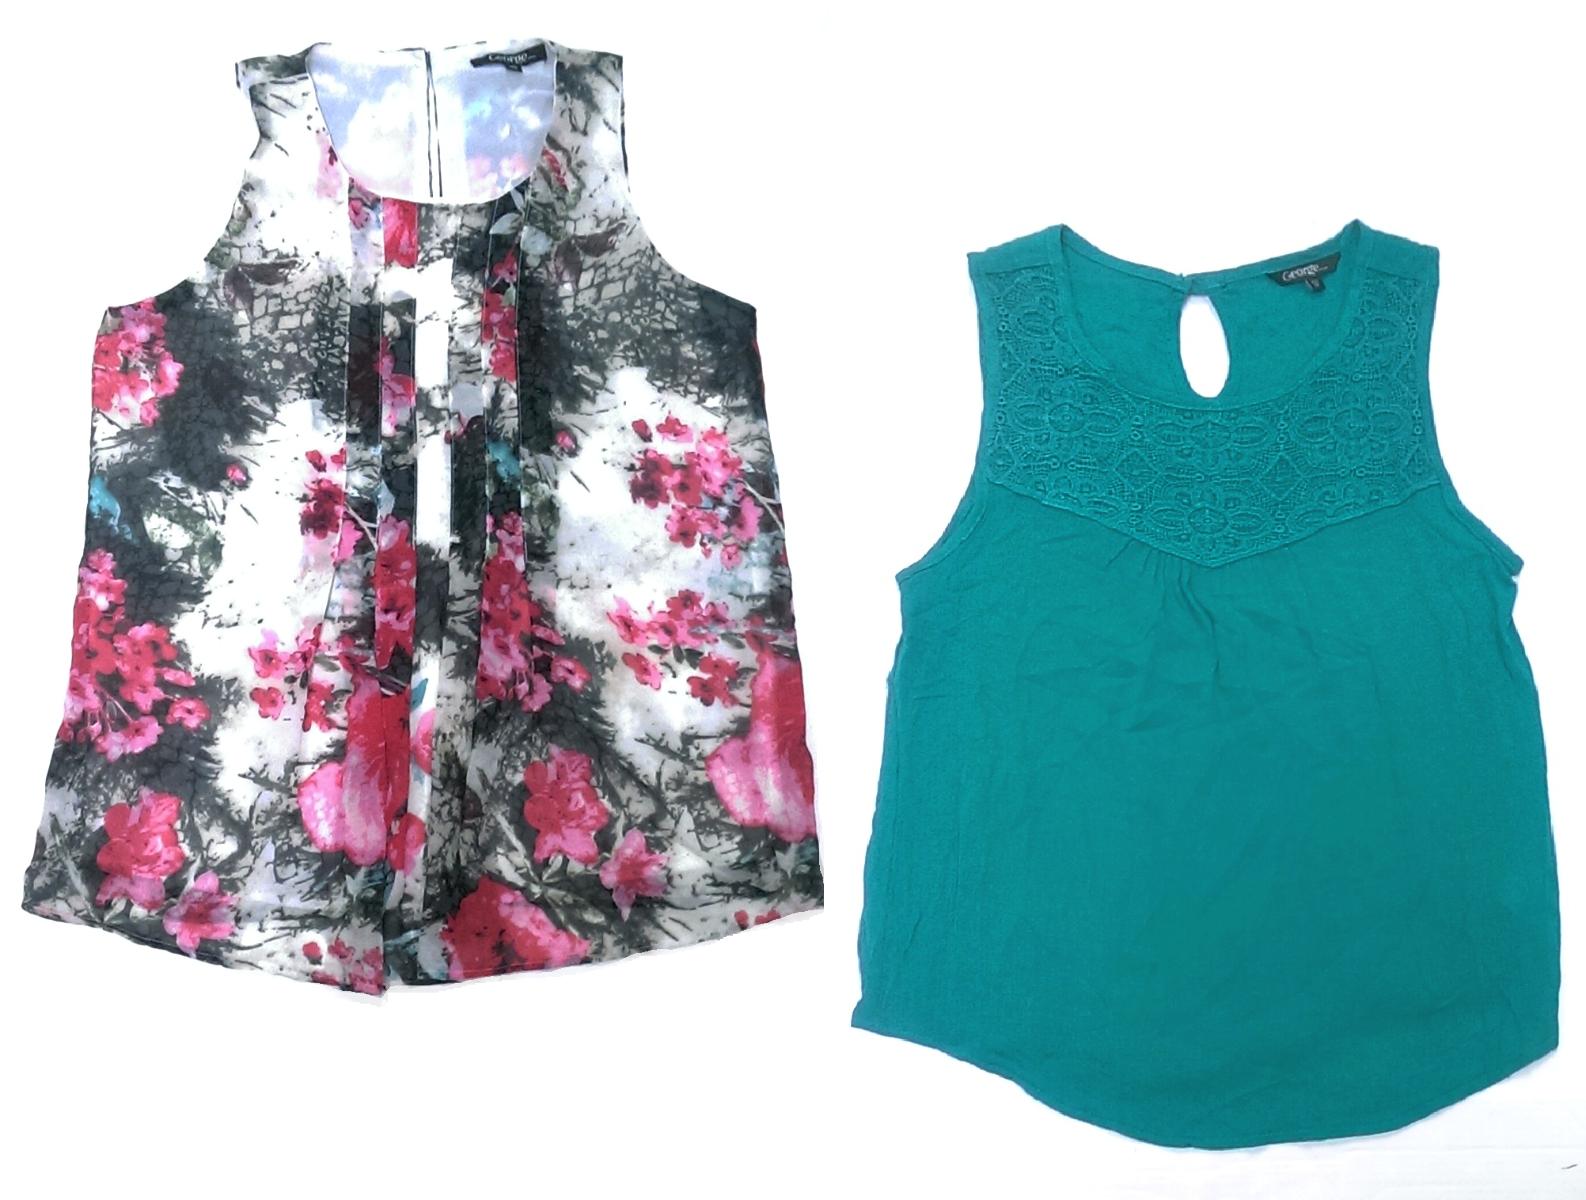 f94ffcc595c6b 2 Womens George Sleeveless Fashion Tank Tops and 21 similar items. S l1600